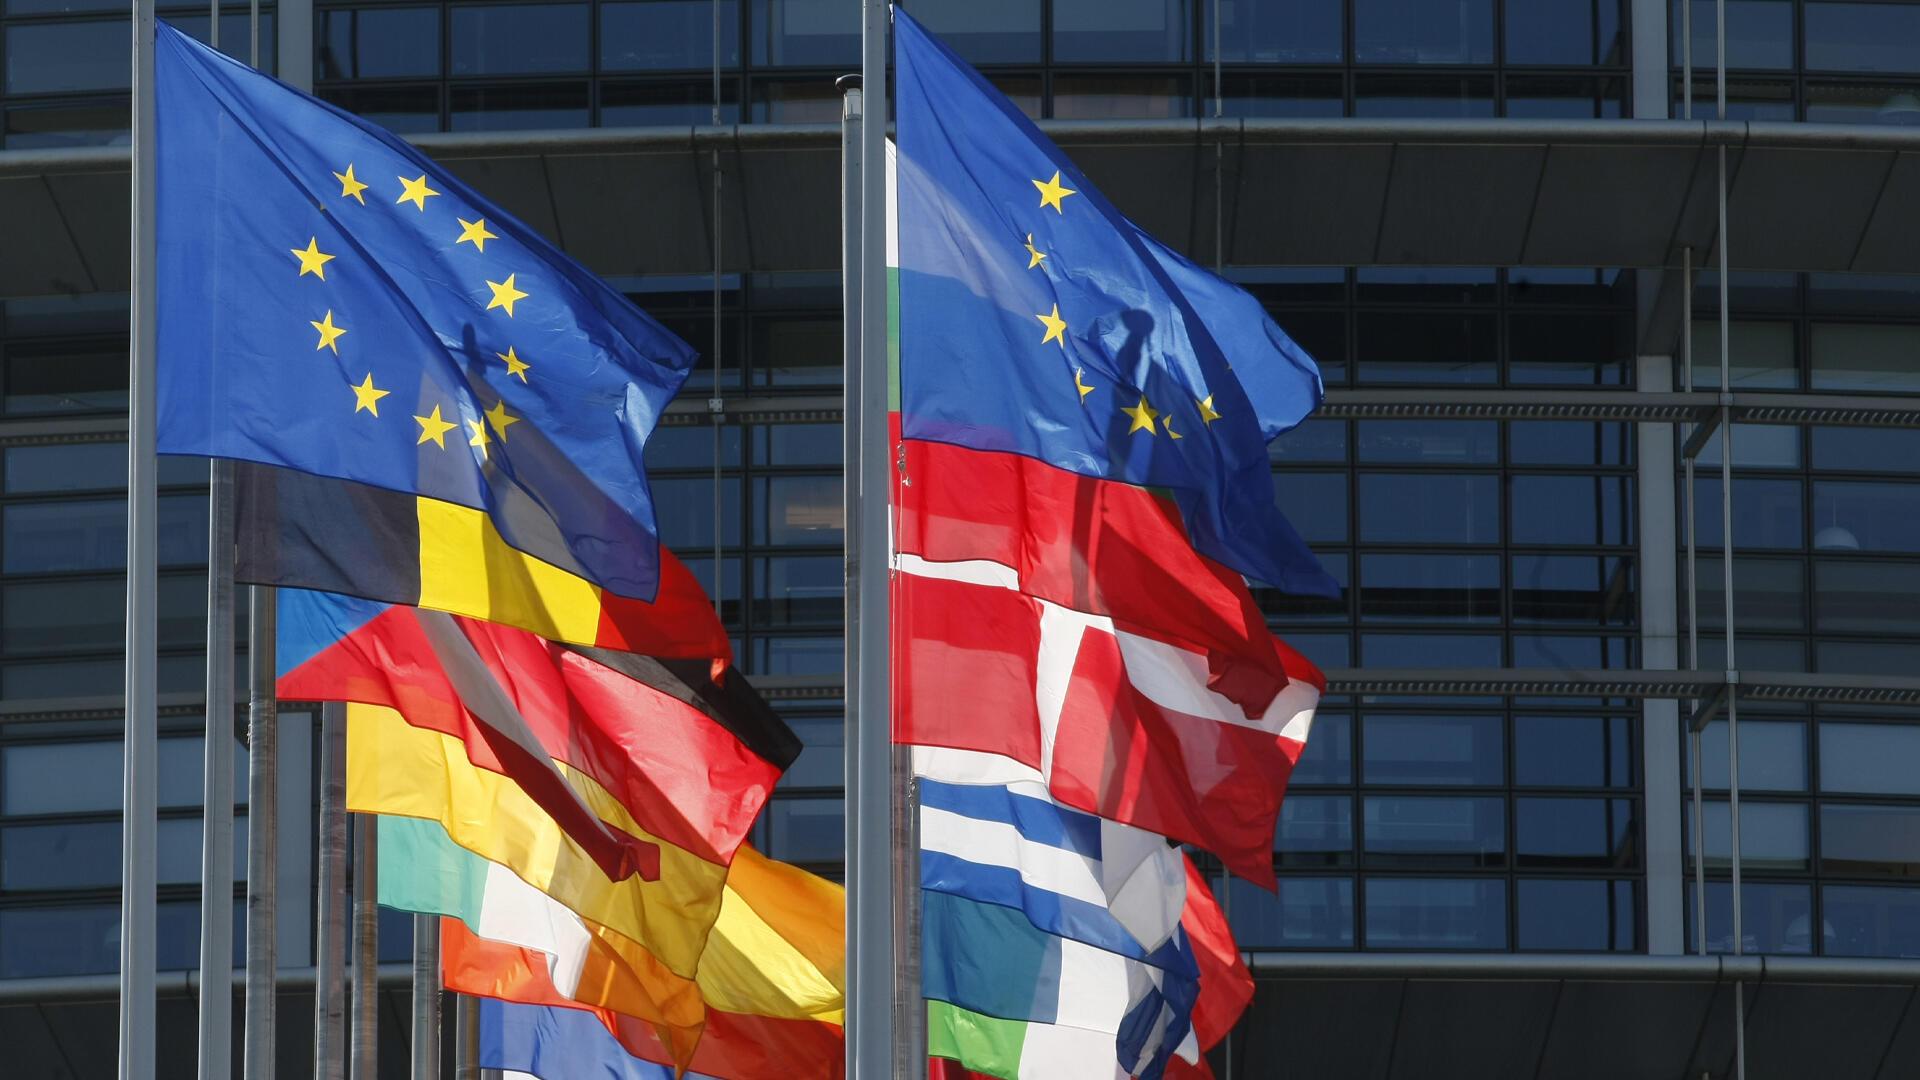 Europe - drapeaux union europeenne_carrefour europe 2 juillet 2021